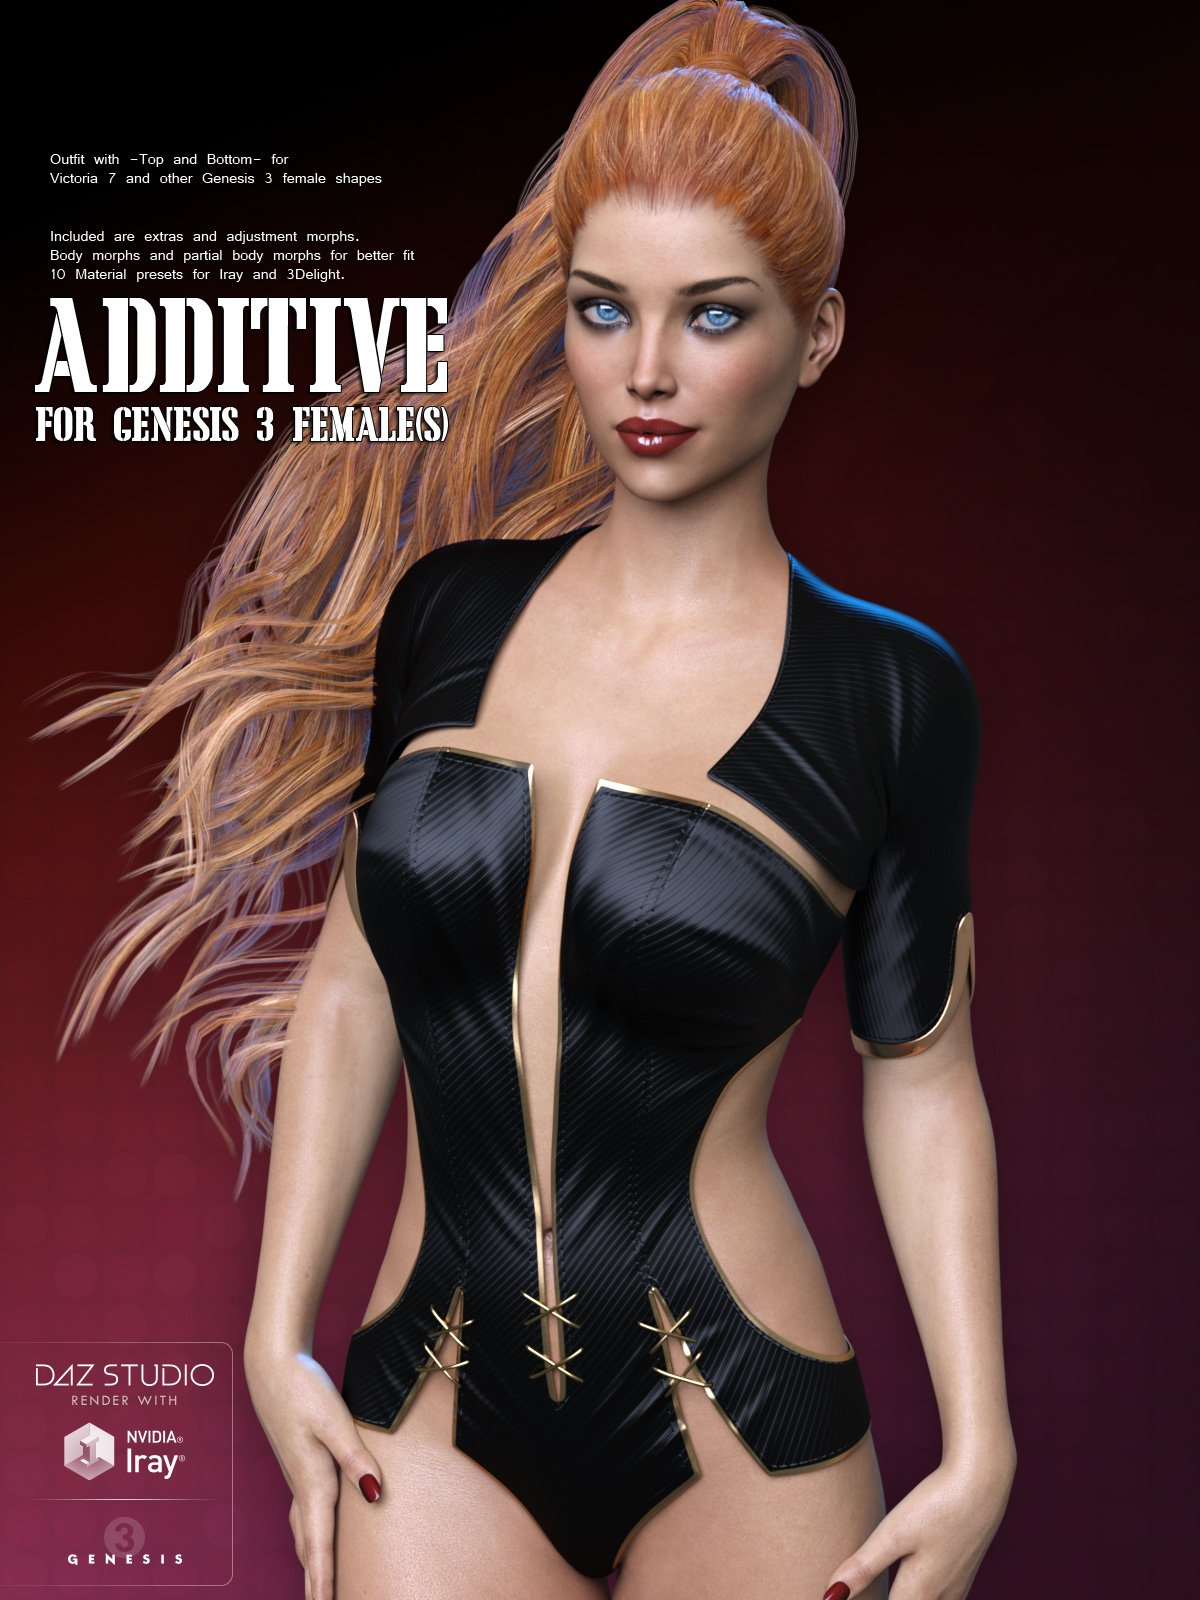 Additive for Genesis 3 Female(s)_DAZ3D下载站